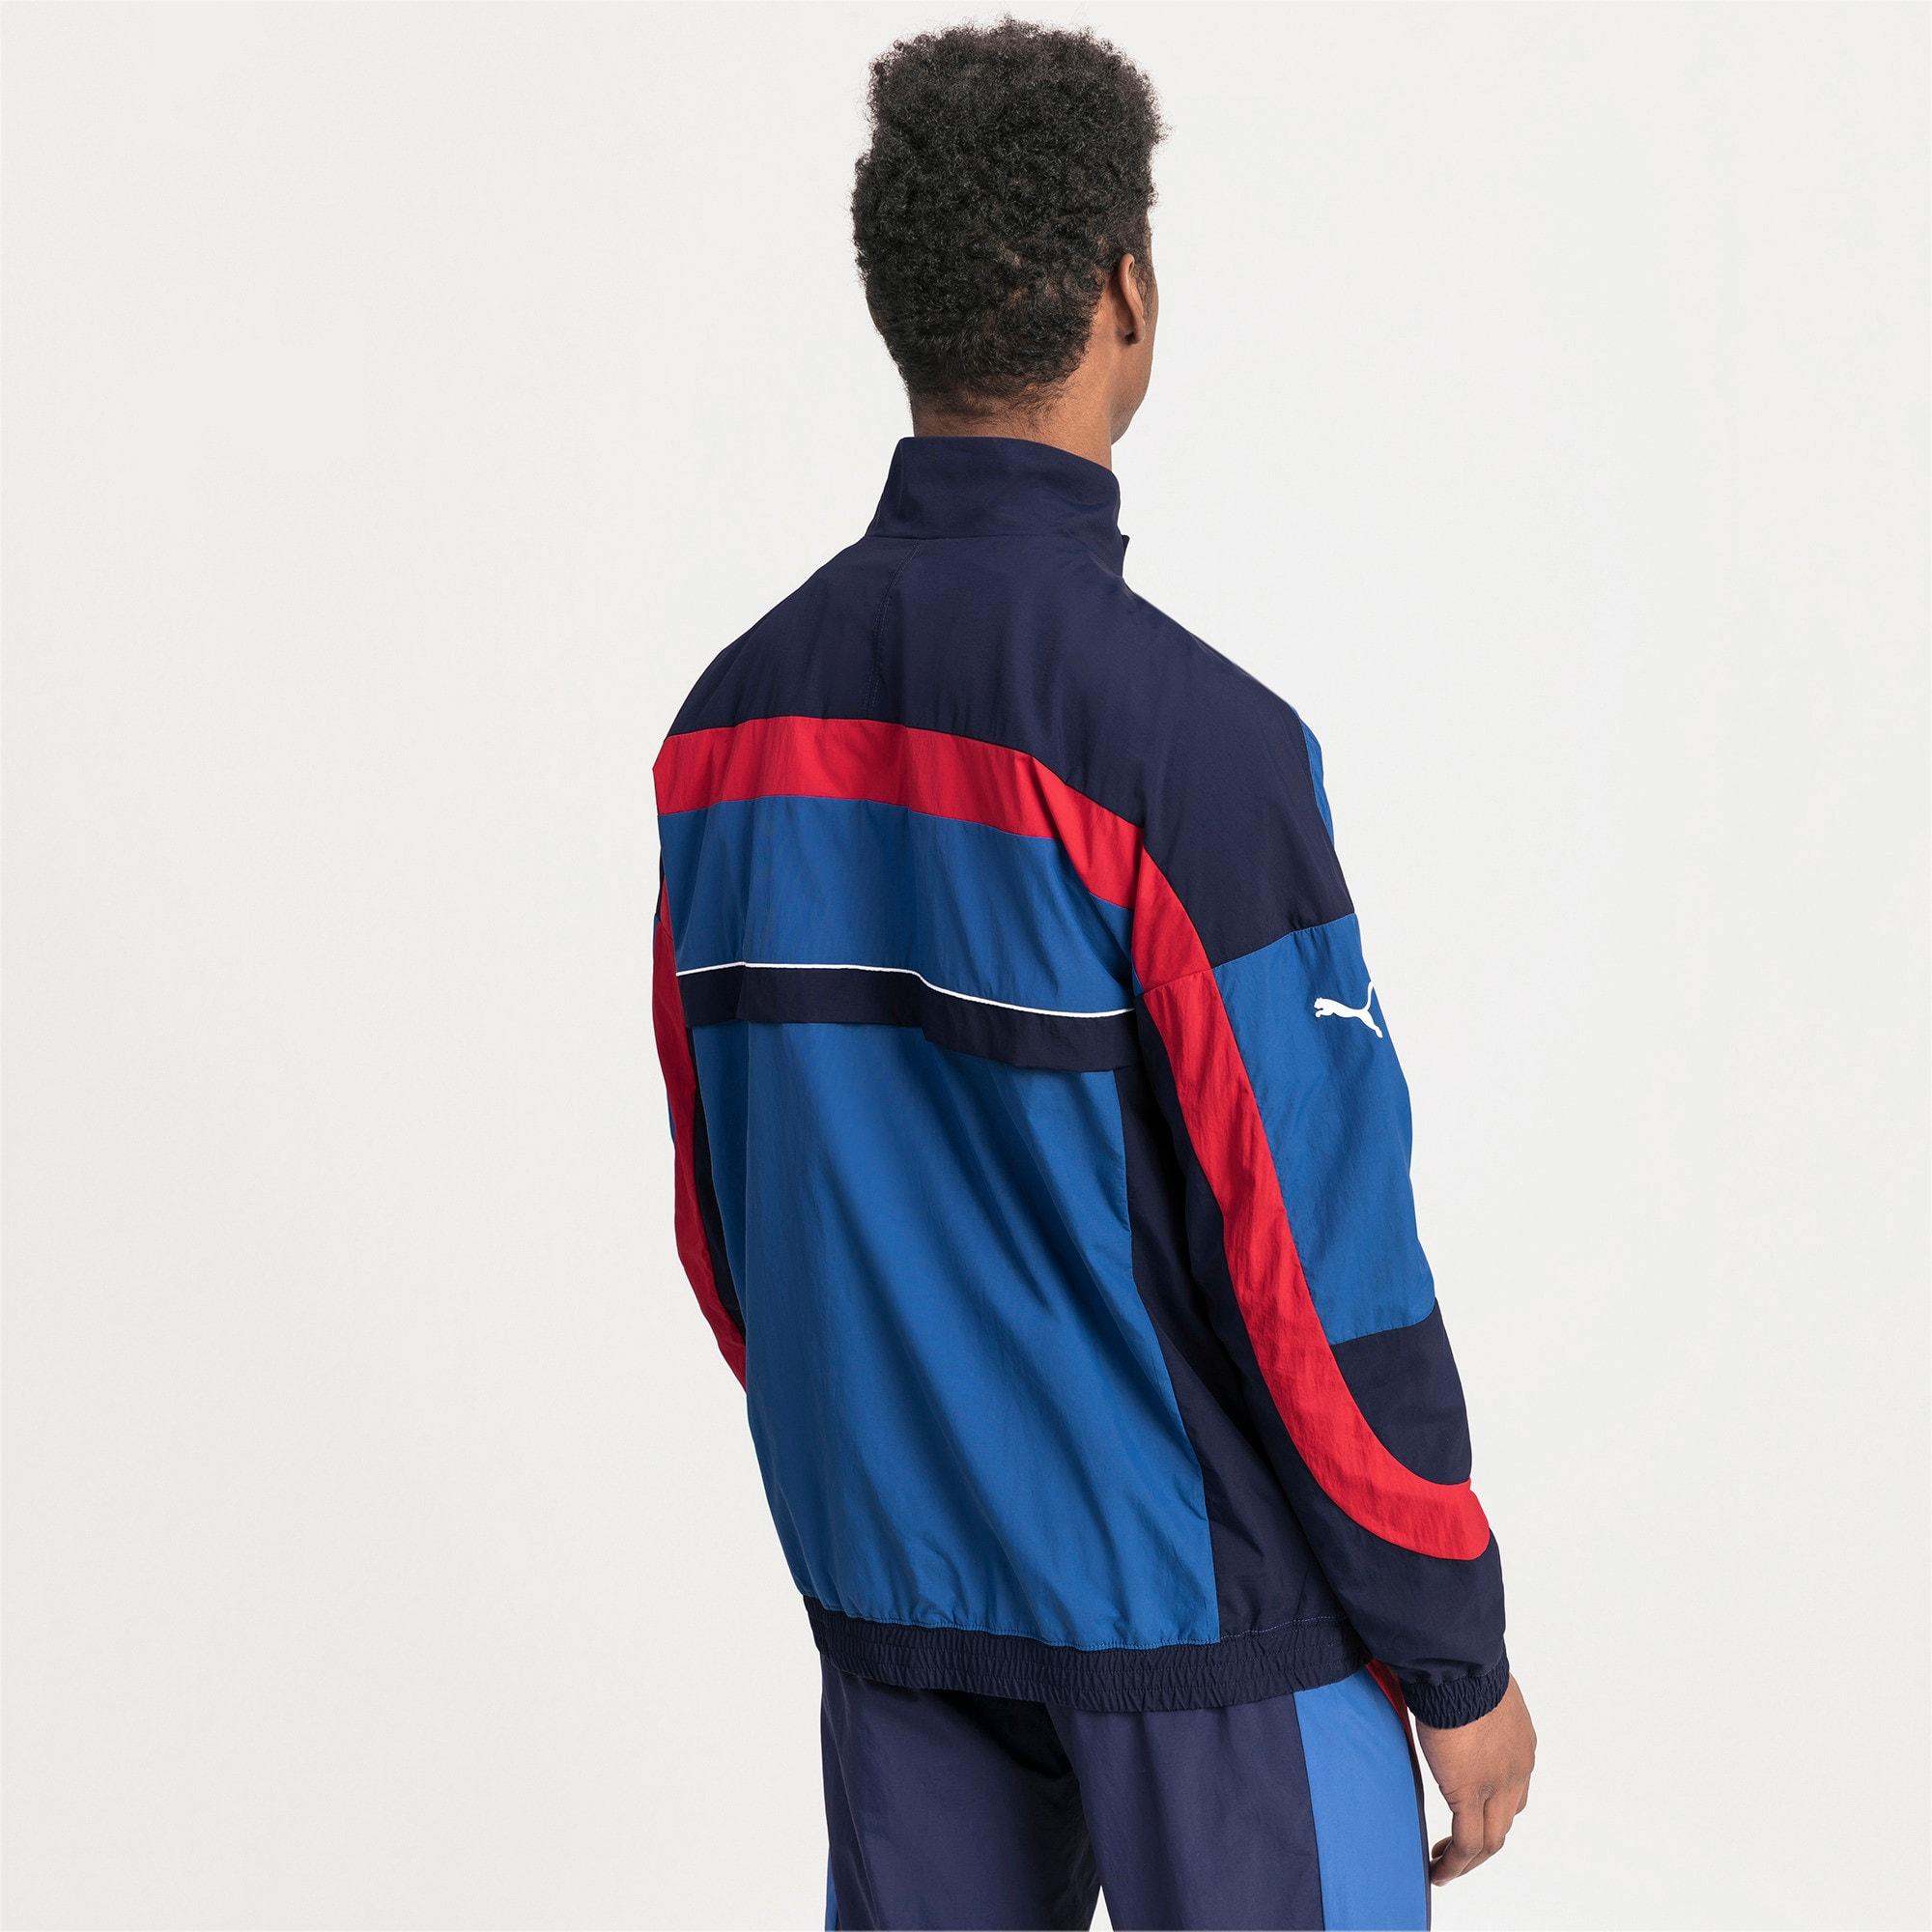 Thumbnail 2 van Ferrari Street geweven jas voor mannen, Galaxy-blauw, medium